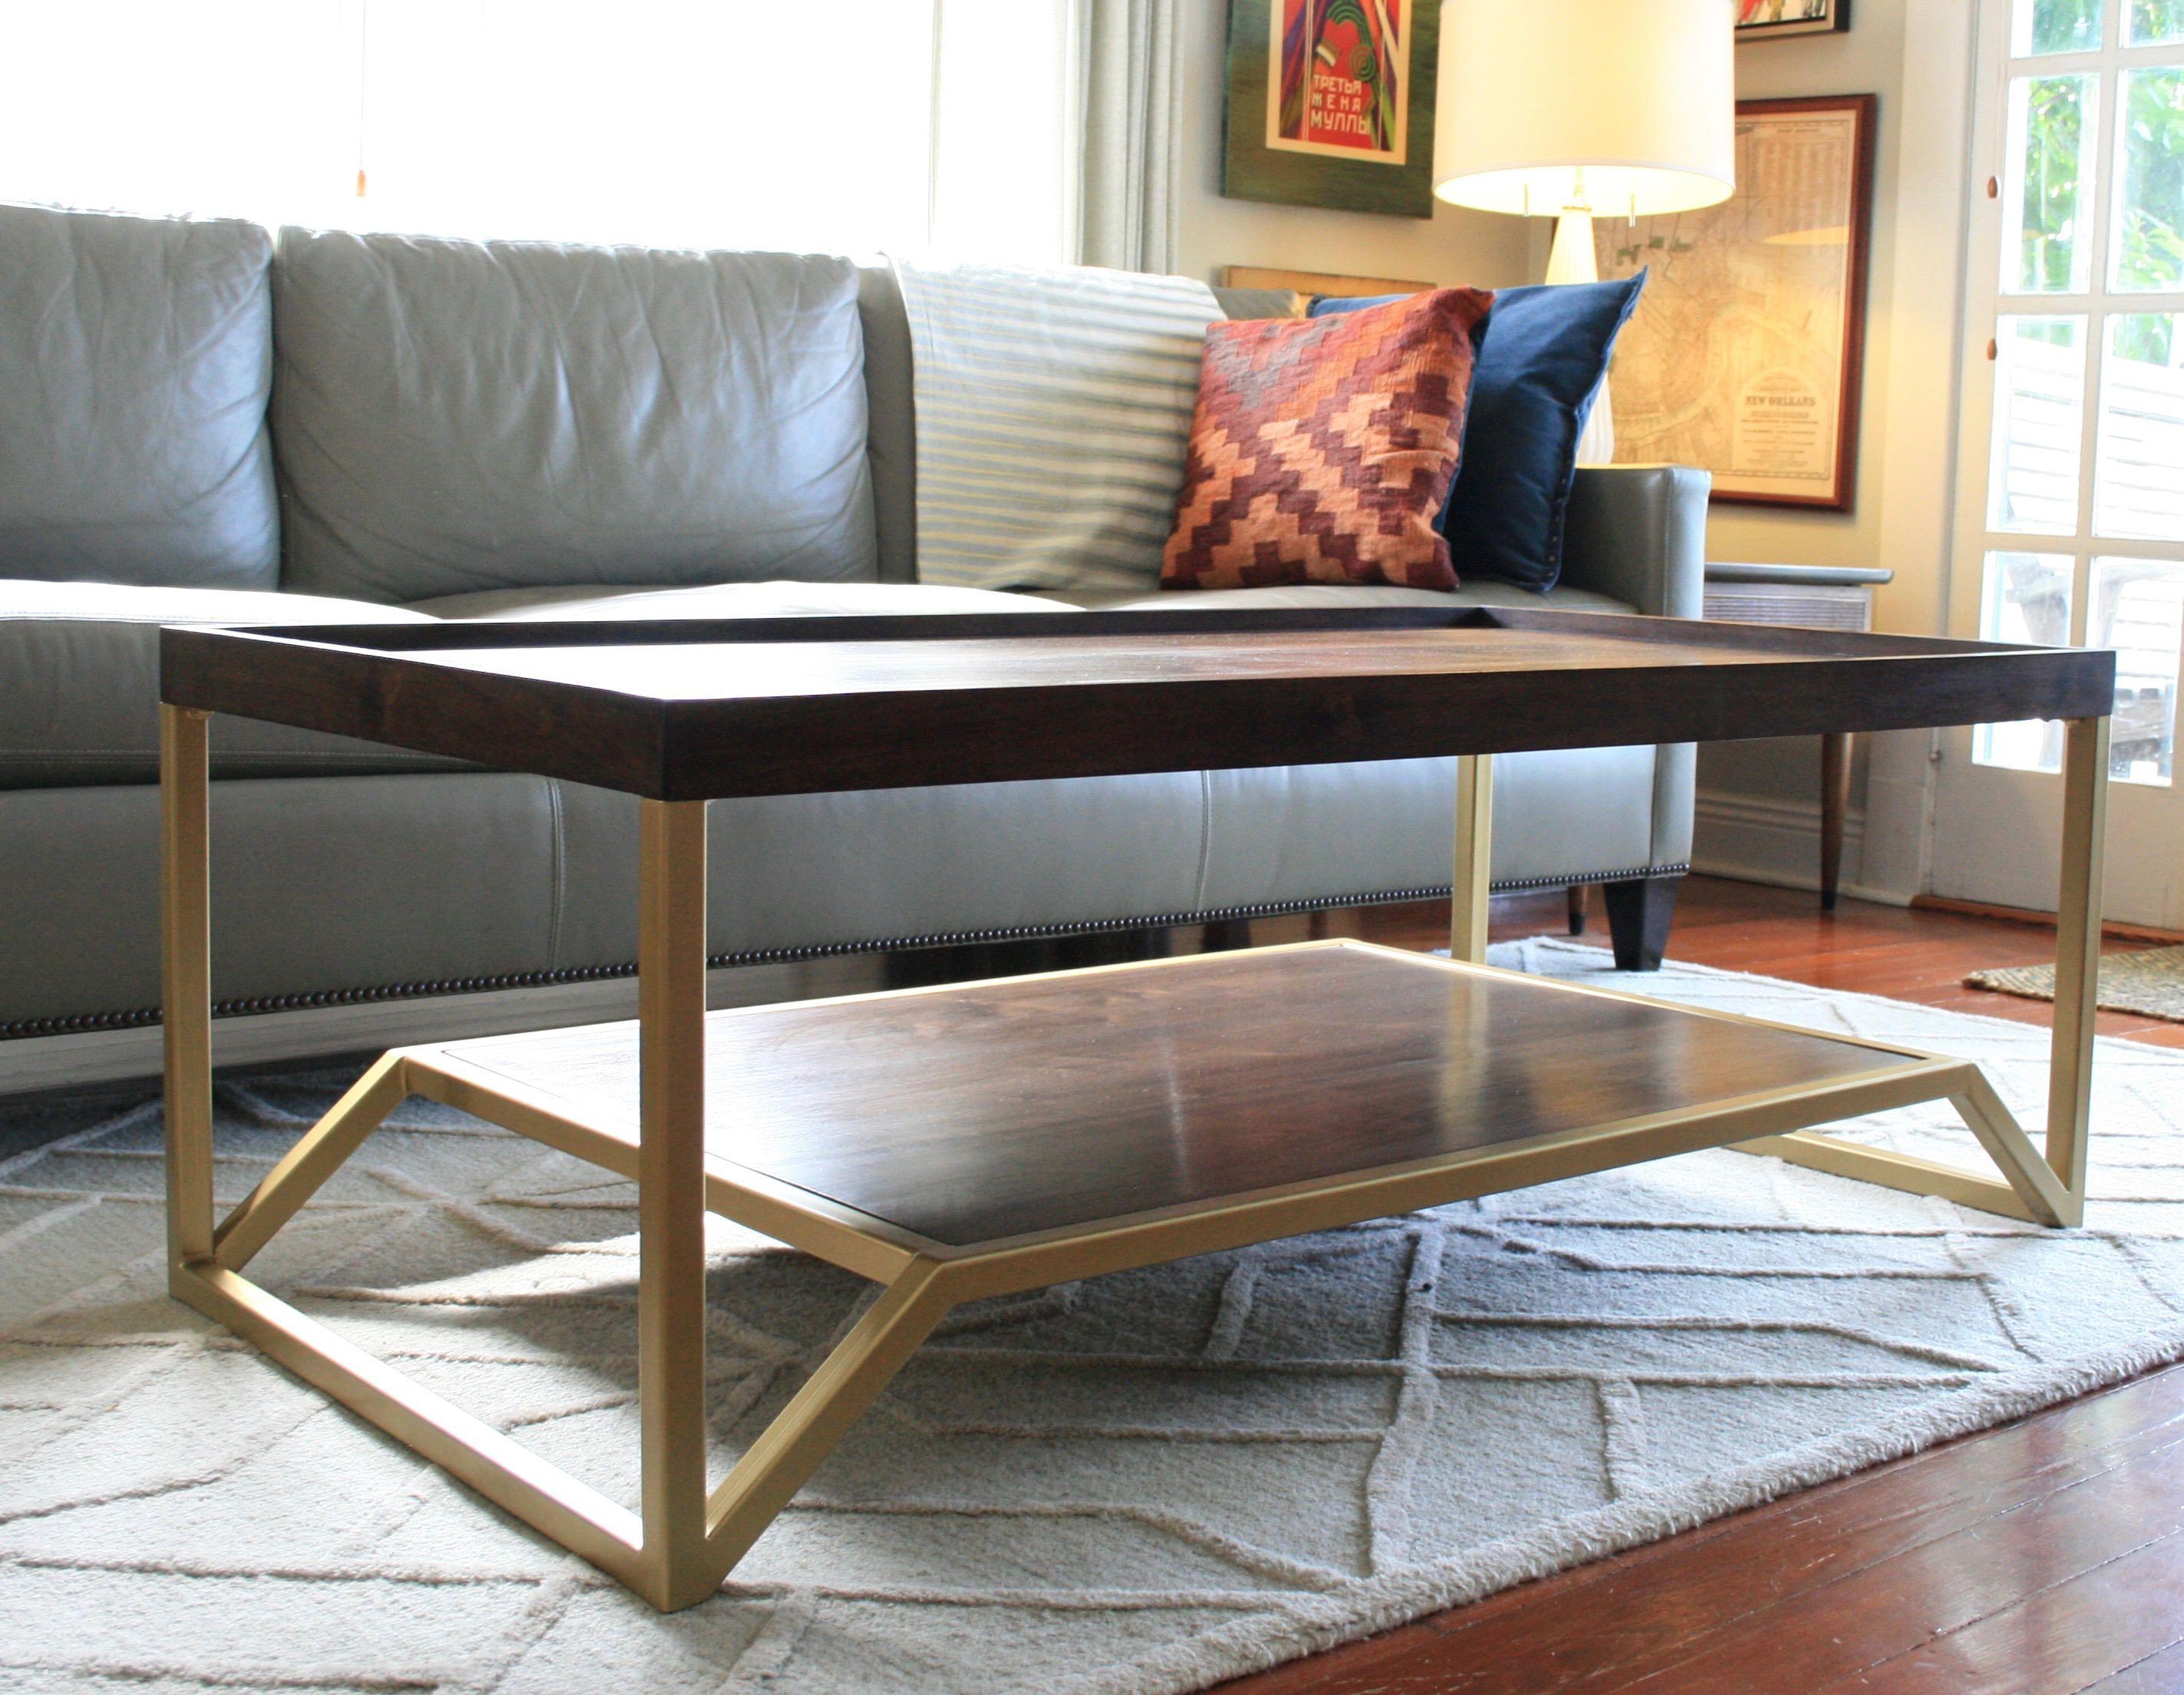 Free Shipping Onzaga Table Walnut And Brass Mid Century Etsy Mid Century Modern Coffee Table Coffee Table Living Room Coffee Table [ 2208 x 2845 Pixel ]